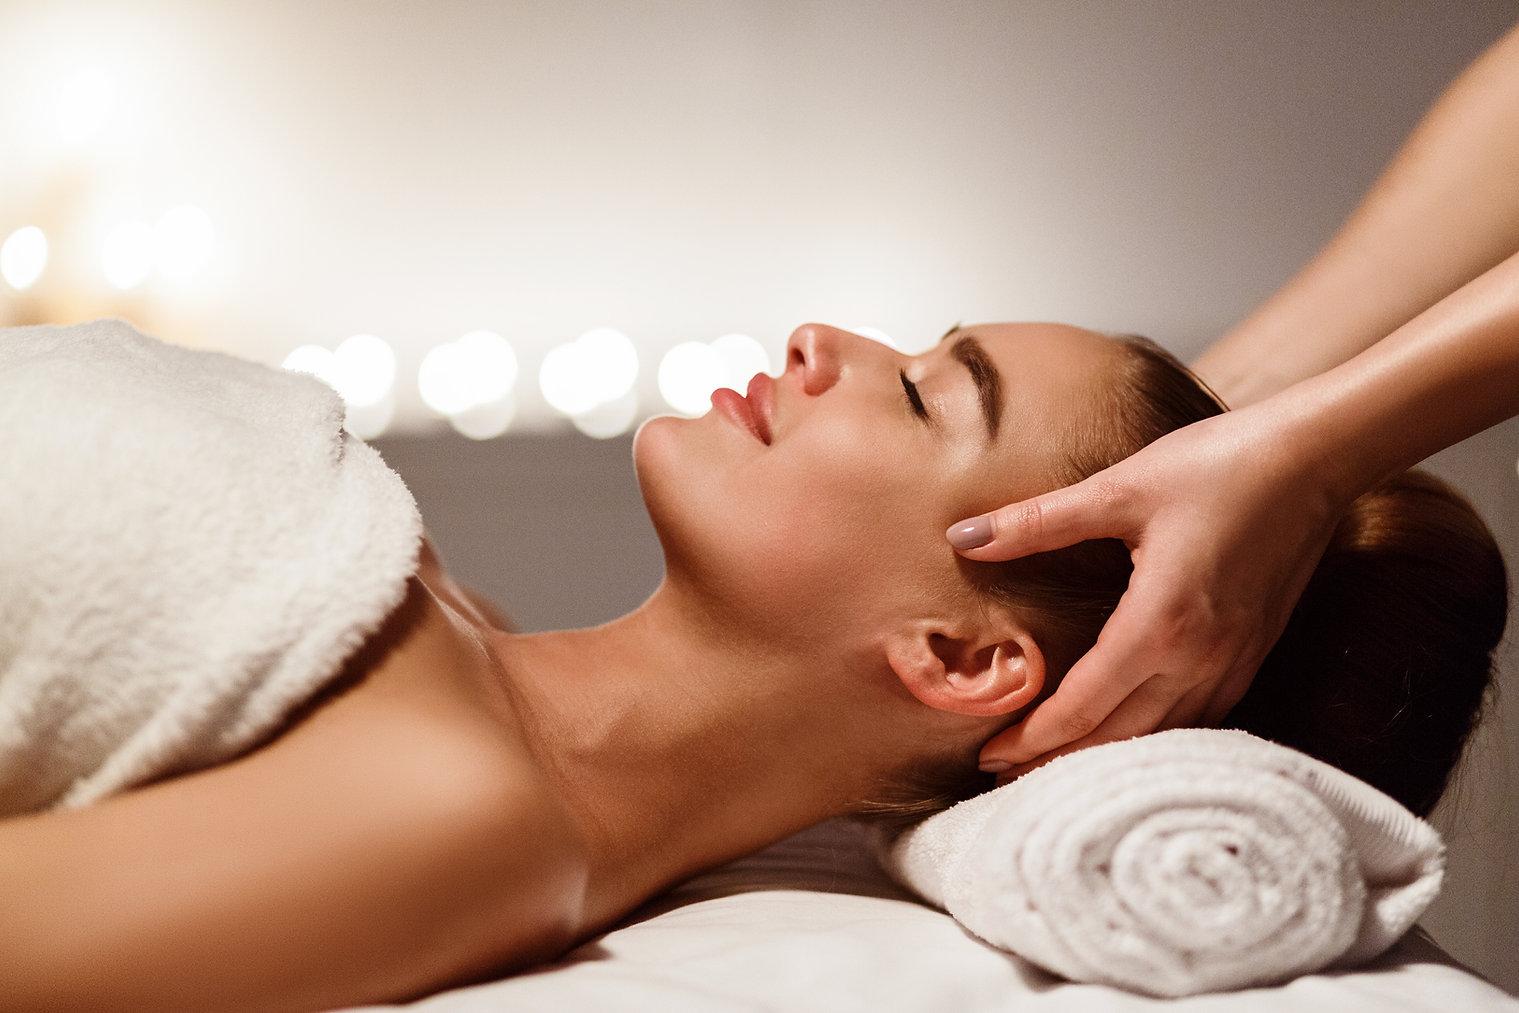 Relaxing massage. Woman receiving head m